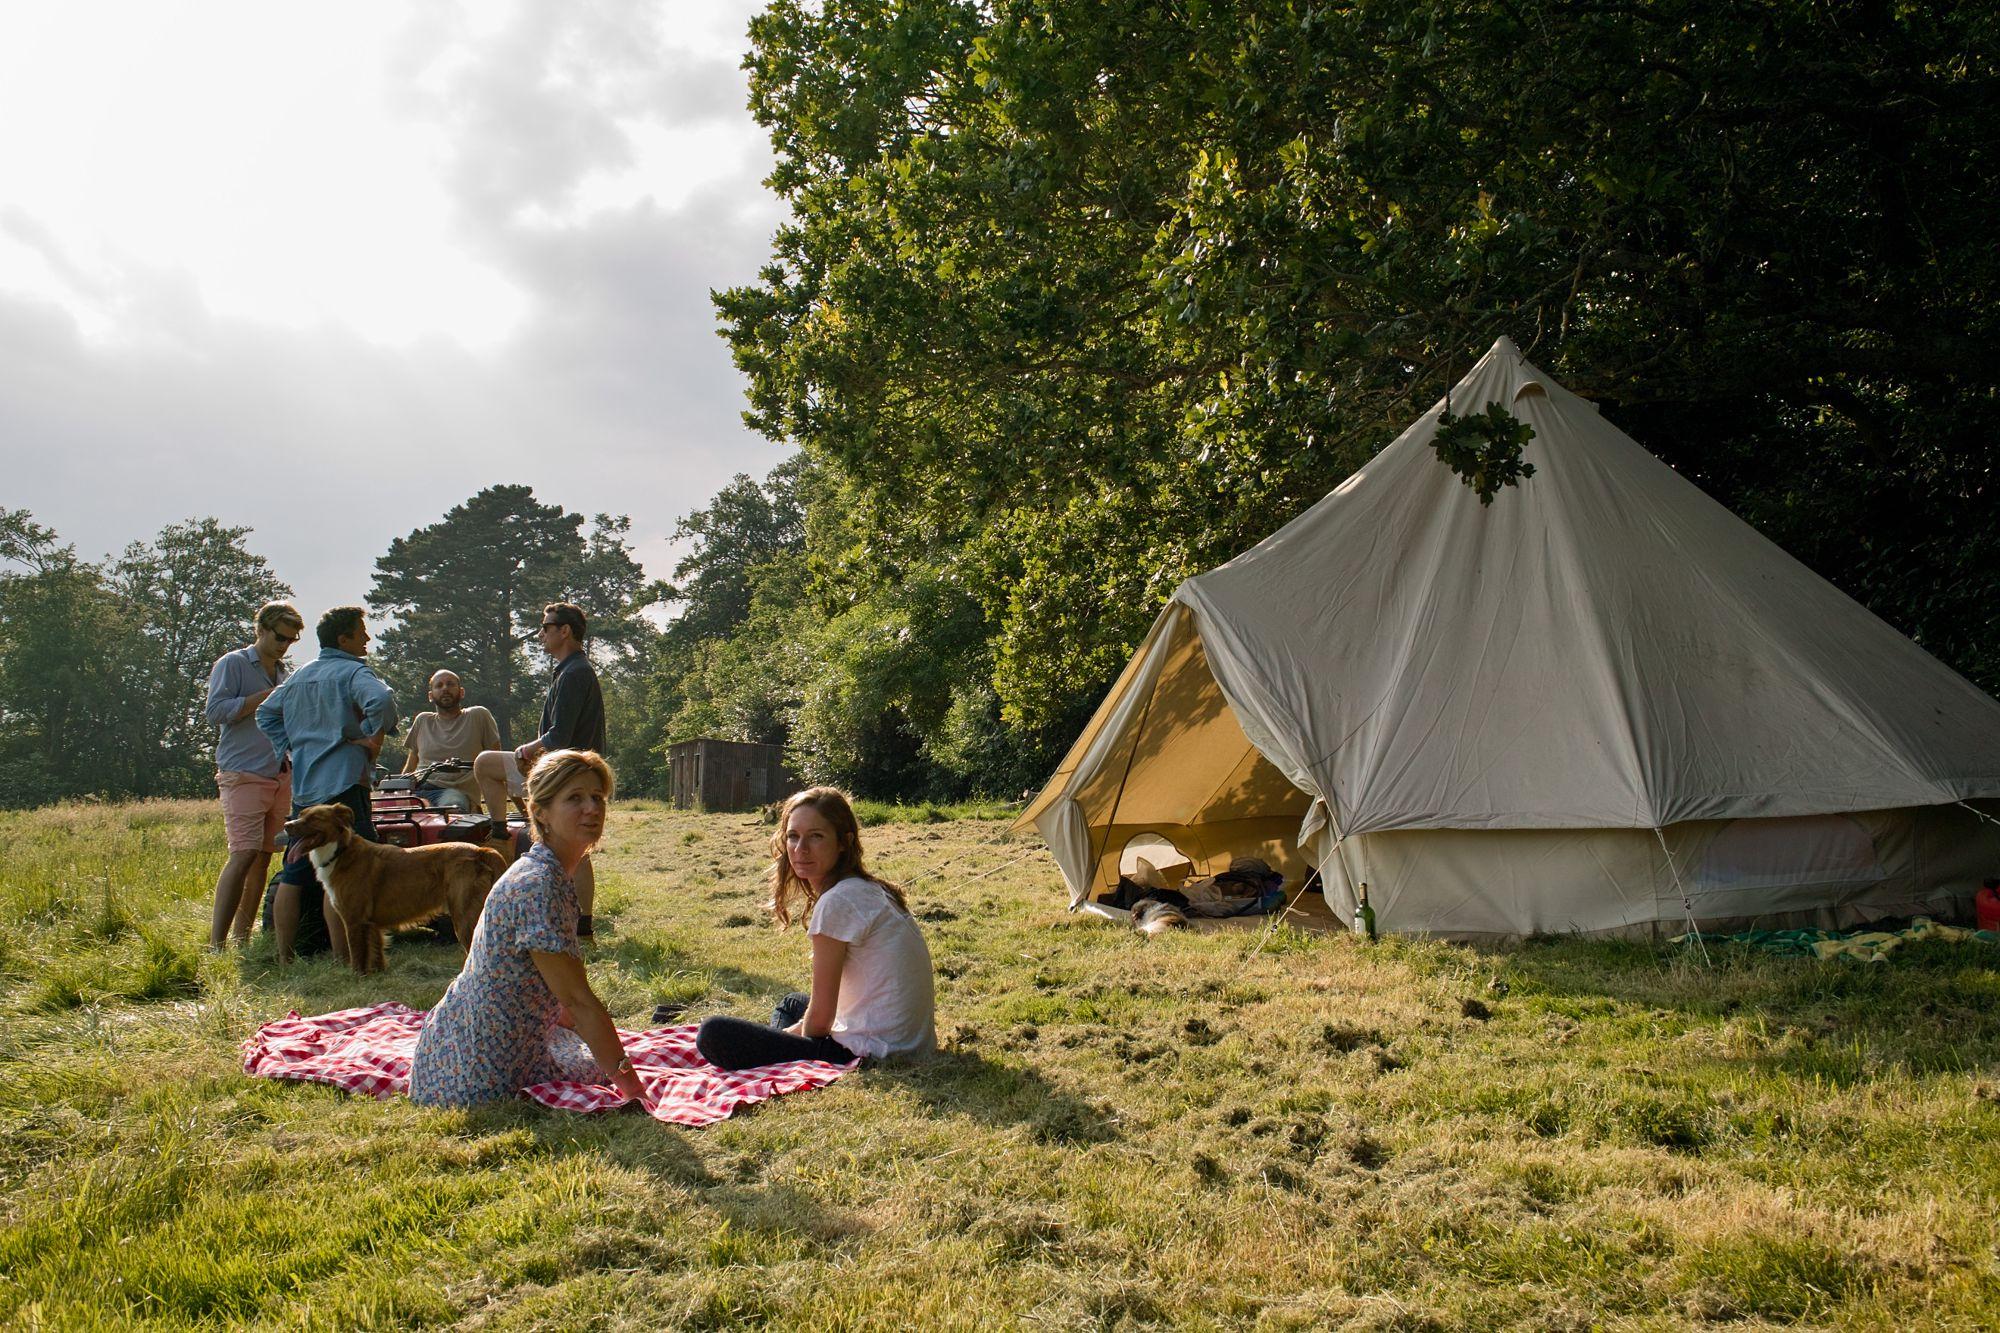 Campsites in Wimborne Minster – Cool Camping